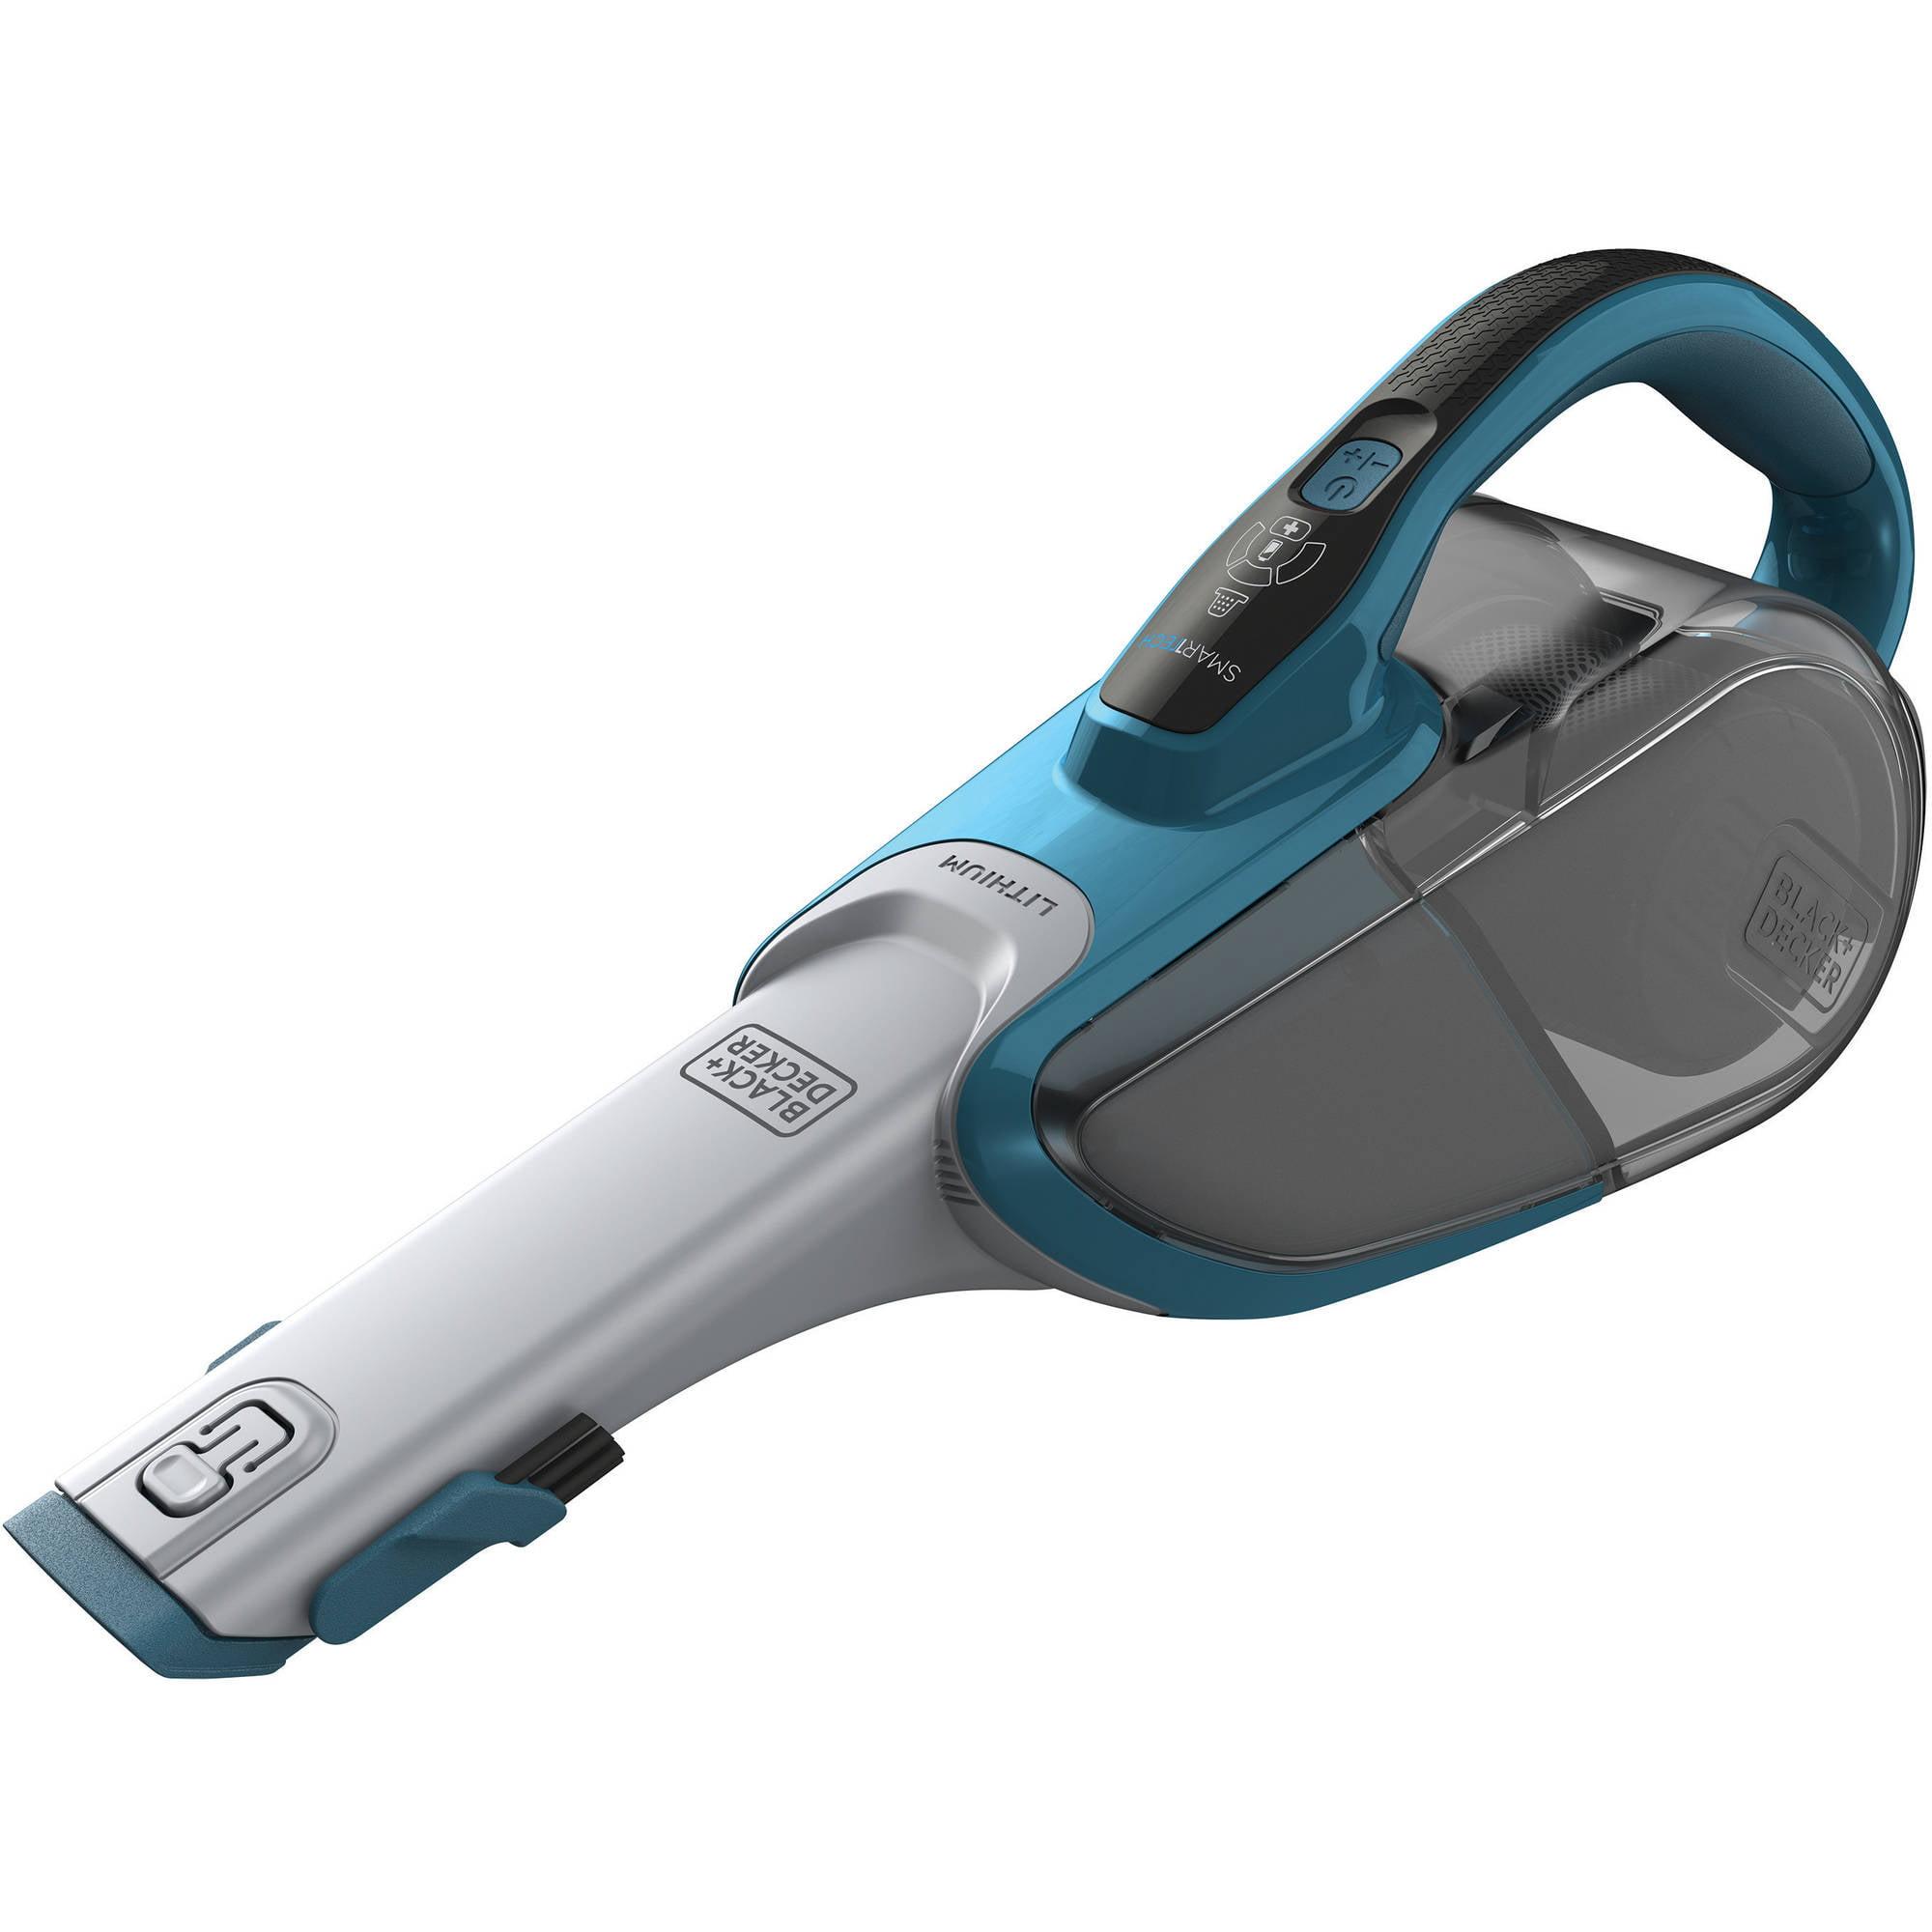 Black and Decker Smartech Lithium Hand Vacuum, HHVJ315BMF22